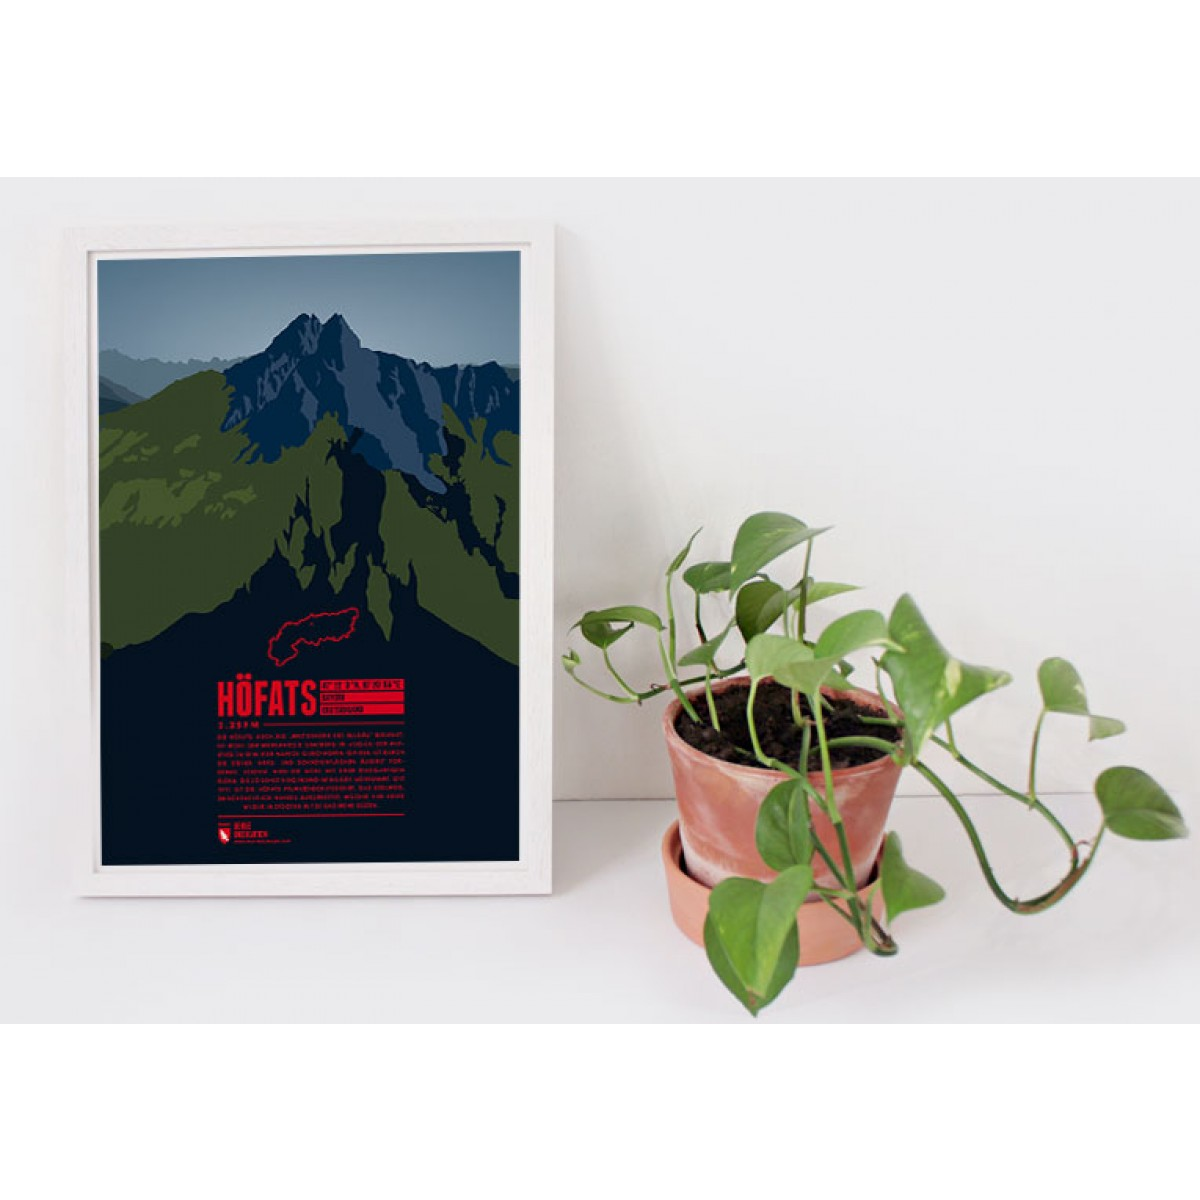 Höfats - Bergdruck